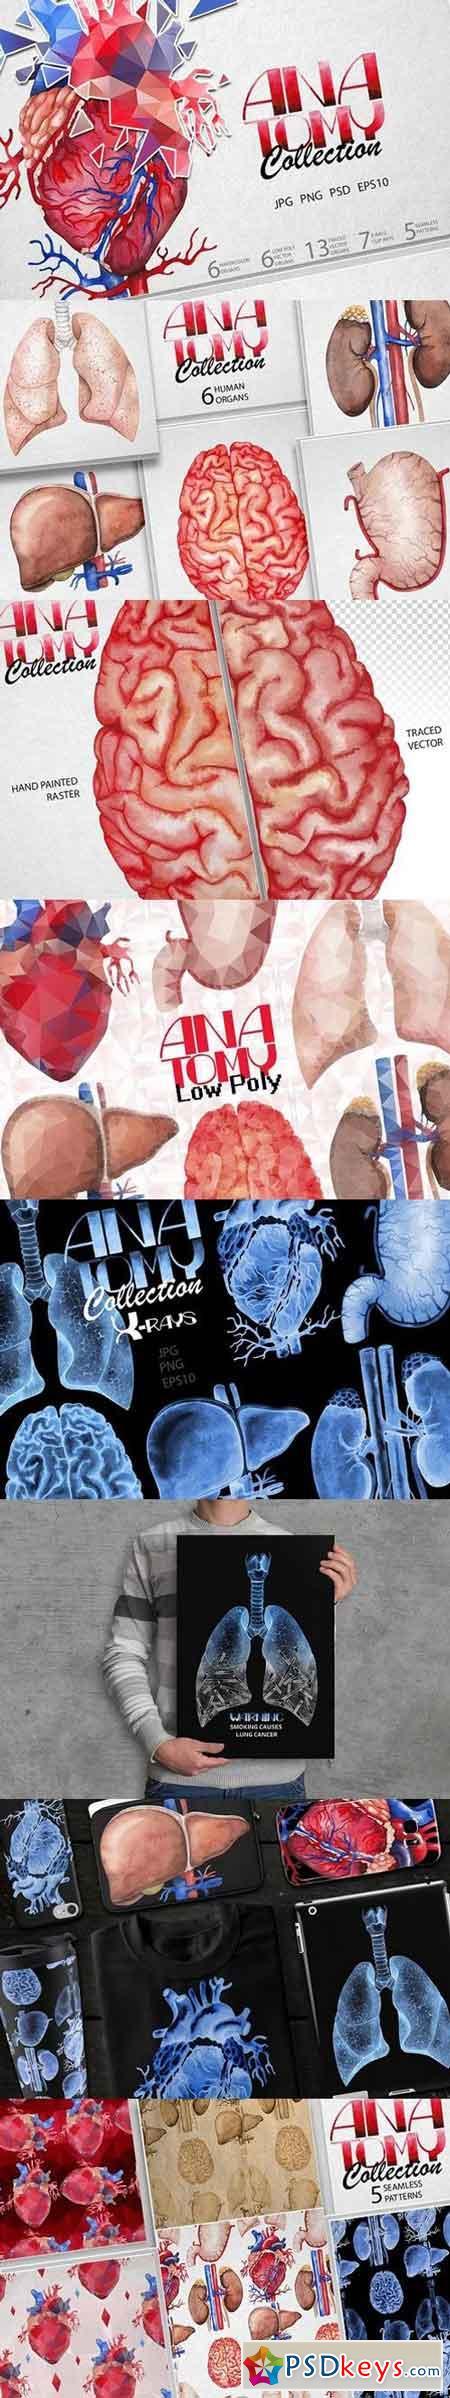 Watercolor human organs 1653607